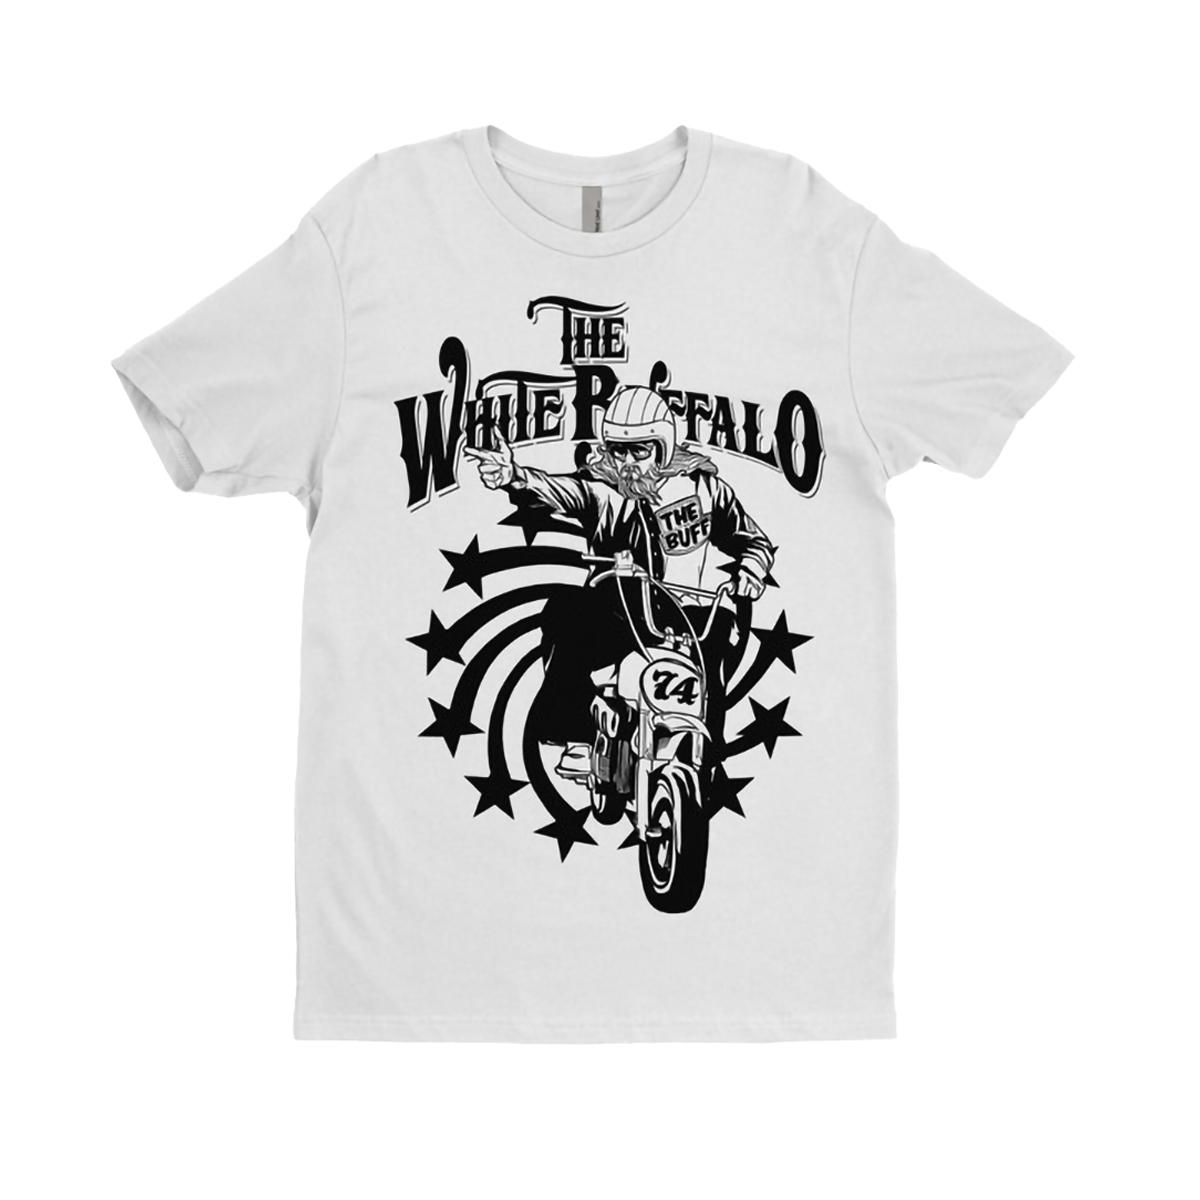 The Buff Shirt